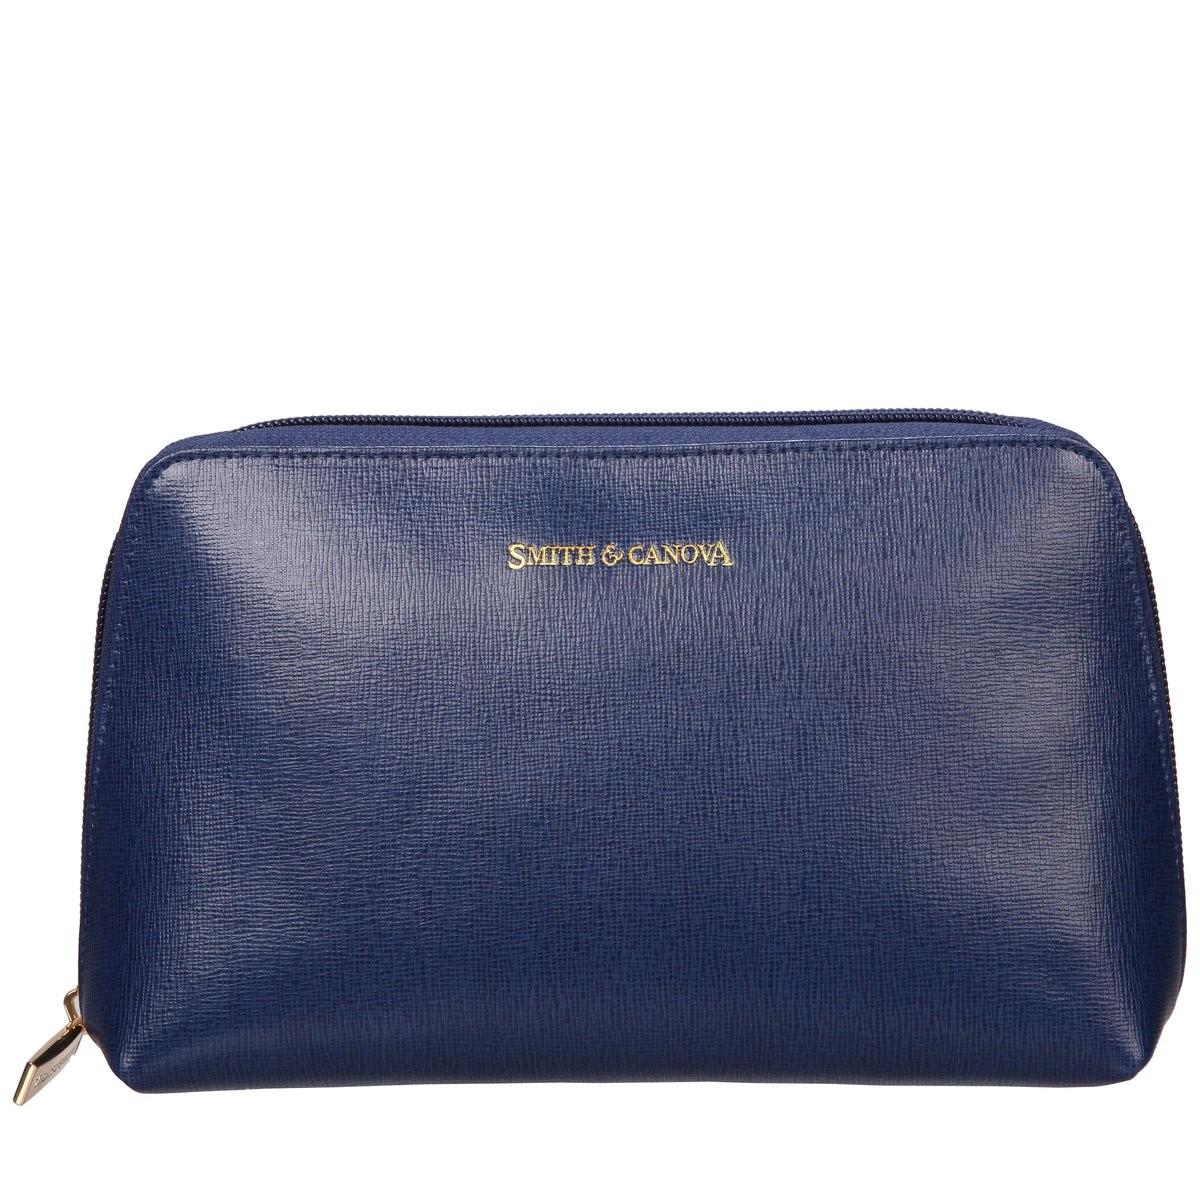 43ce82ec928 Zip Top Cosmetic Bag - Smith   Canova